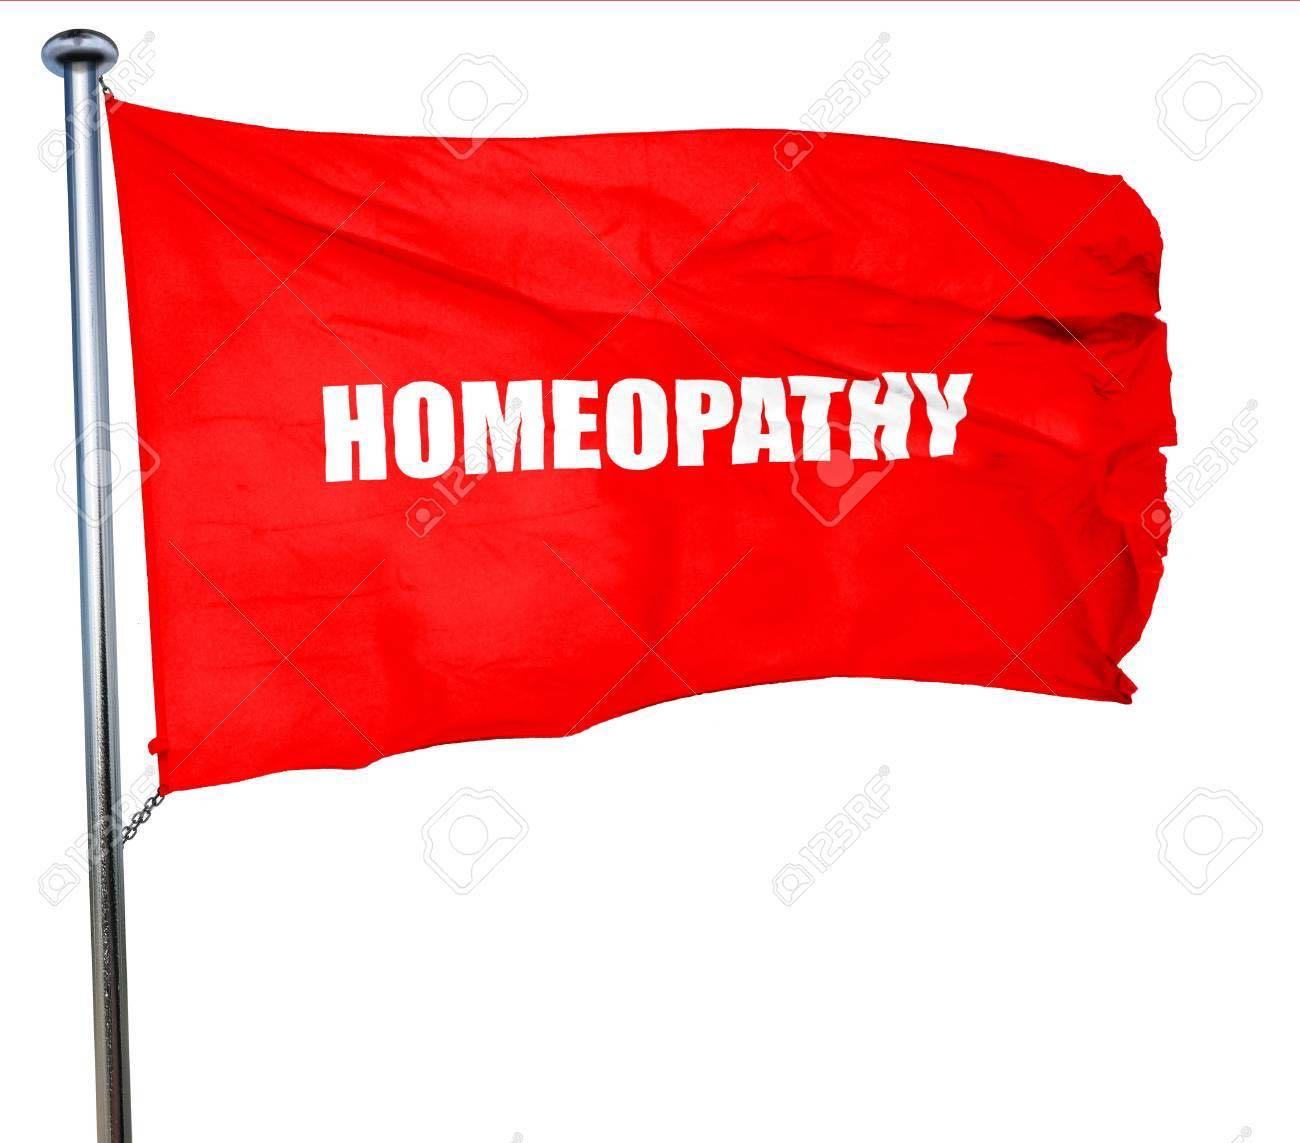 scritta homeopathy su bandiera rossa